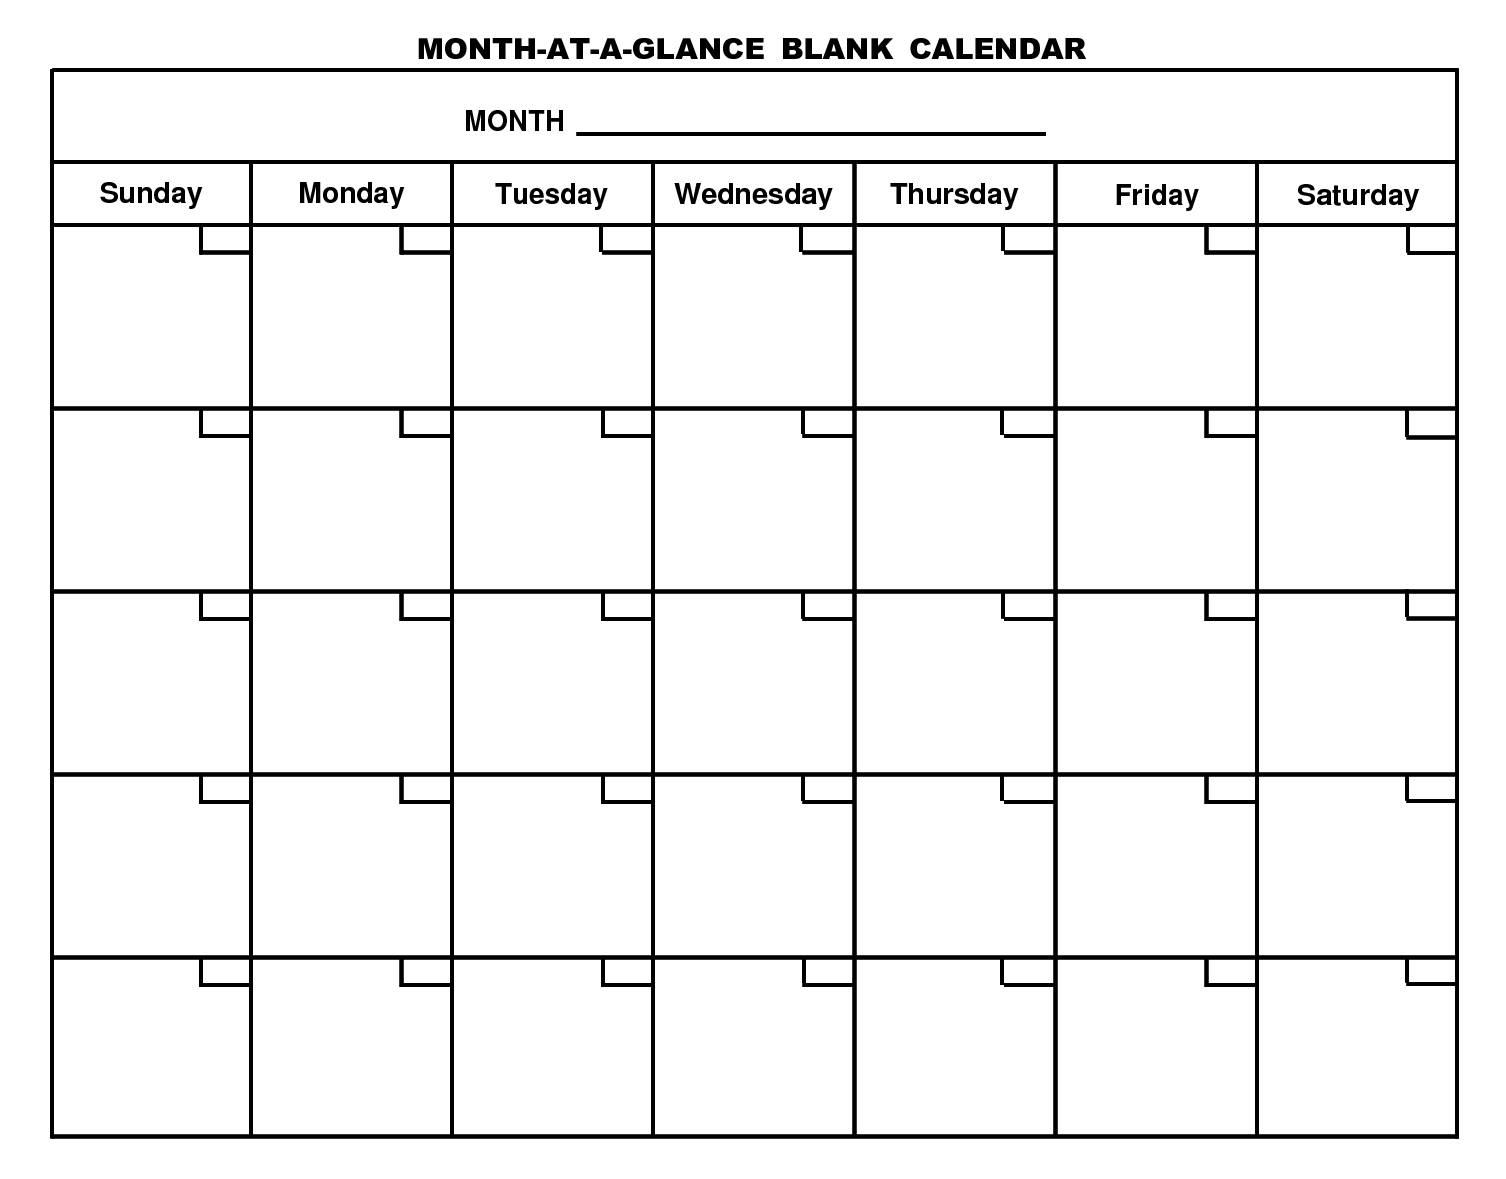 Pinstacy Tangren On Work   Blank Monthly Calendar Template